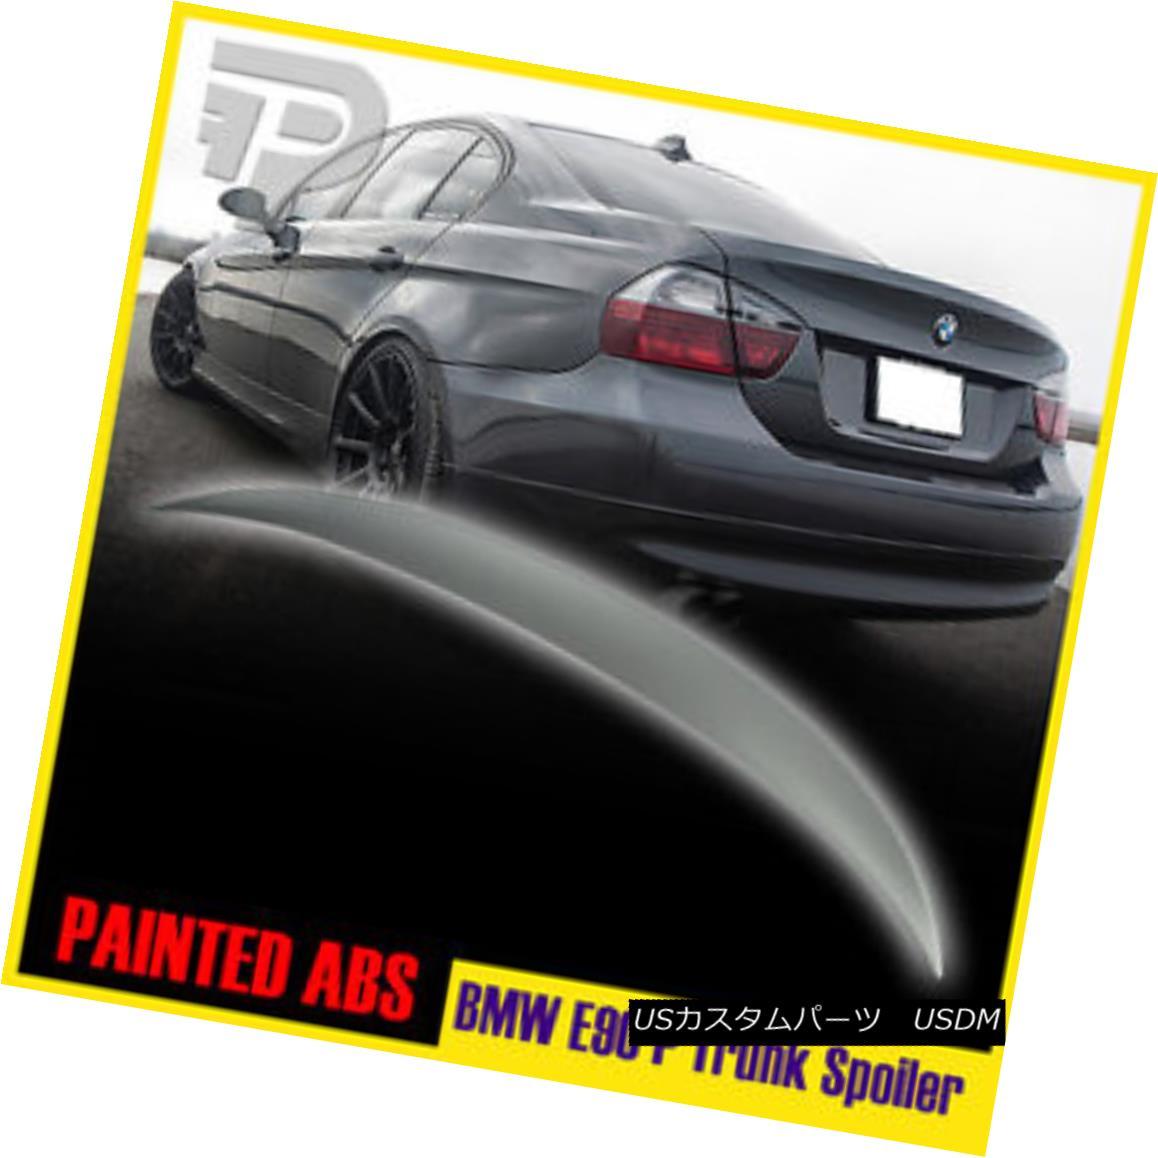 325i M3 328i BMW E90 Sedan Performance Type High Kick Rear Trunk Spoiler ABS 11